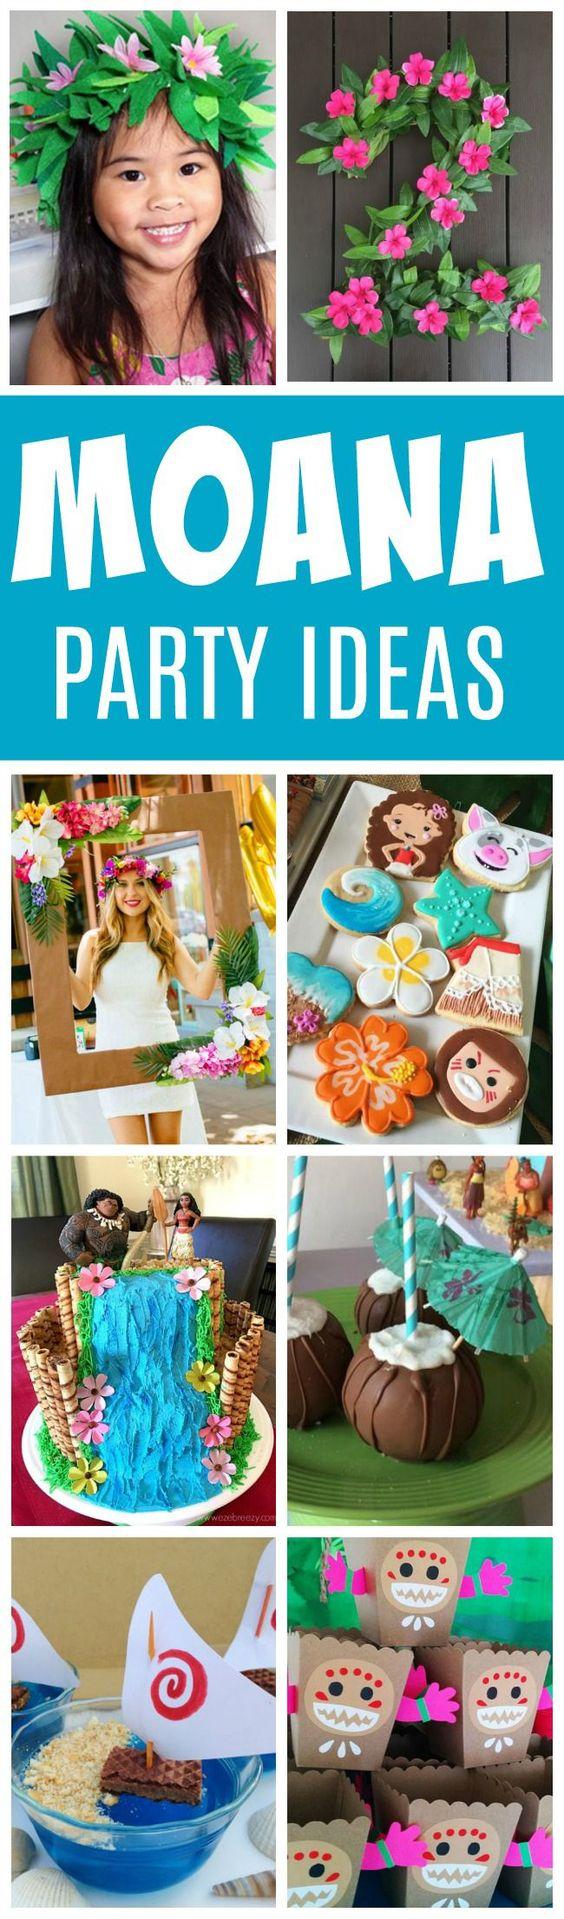 27 Disney Moana Birthday Party Ideas - Pretty My Party